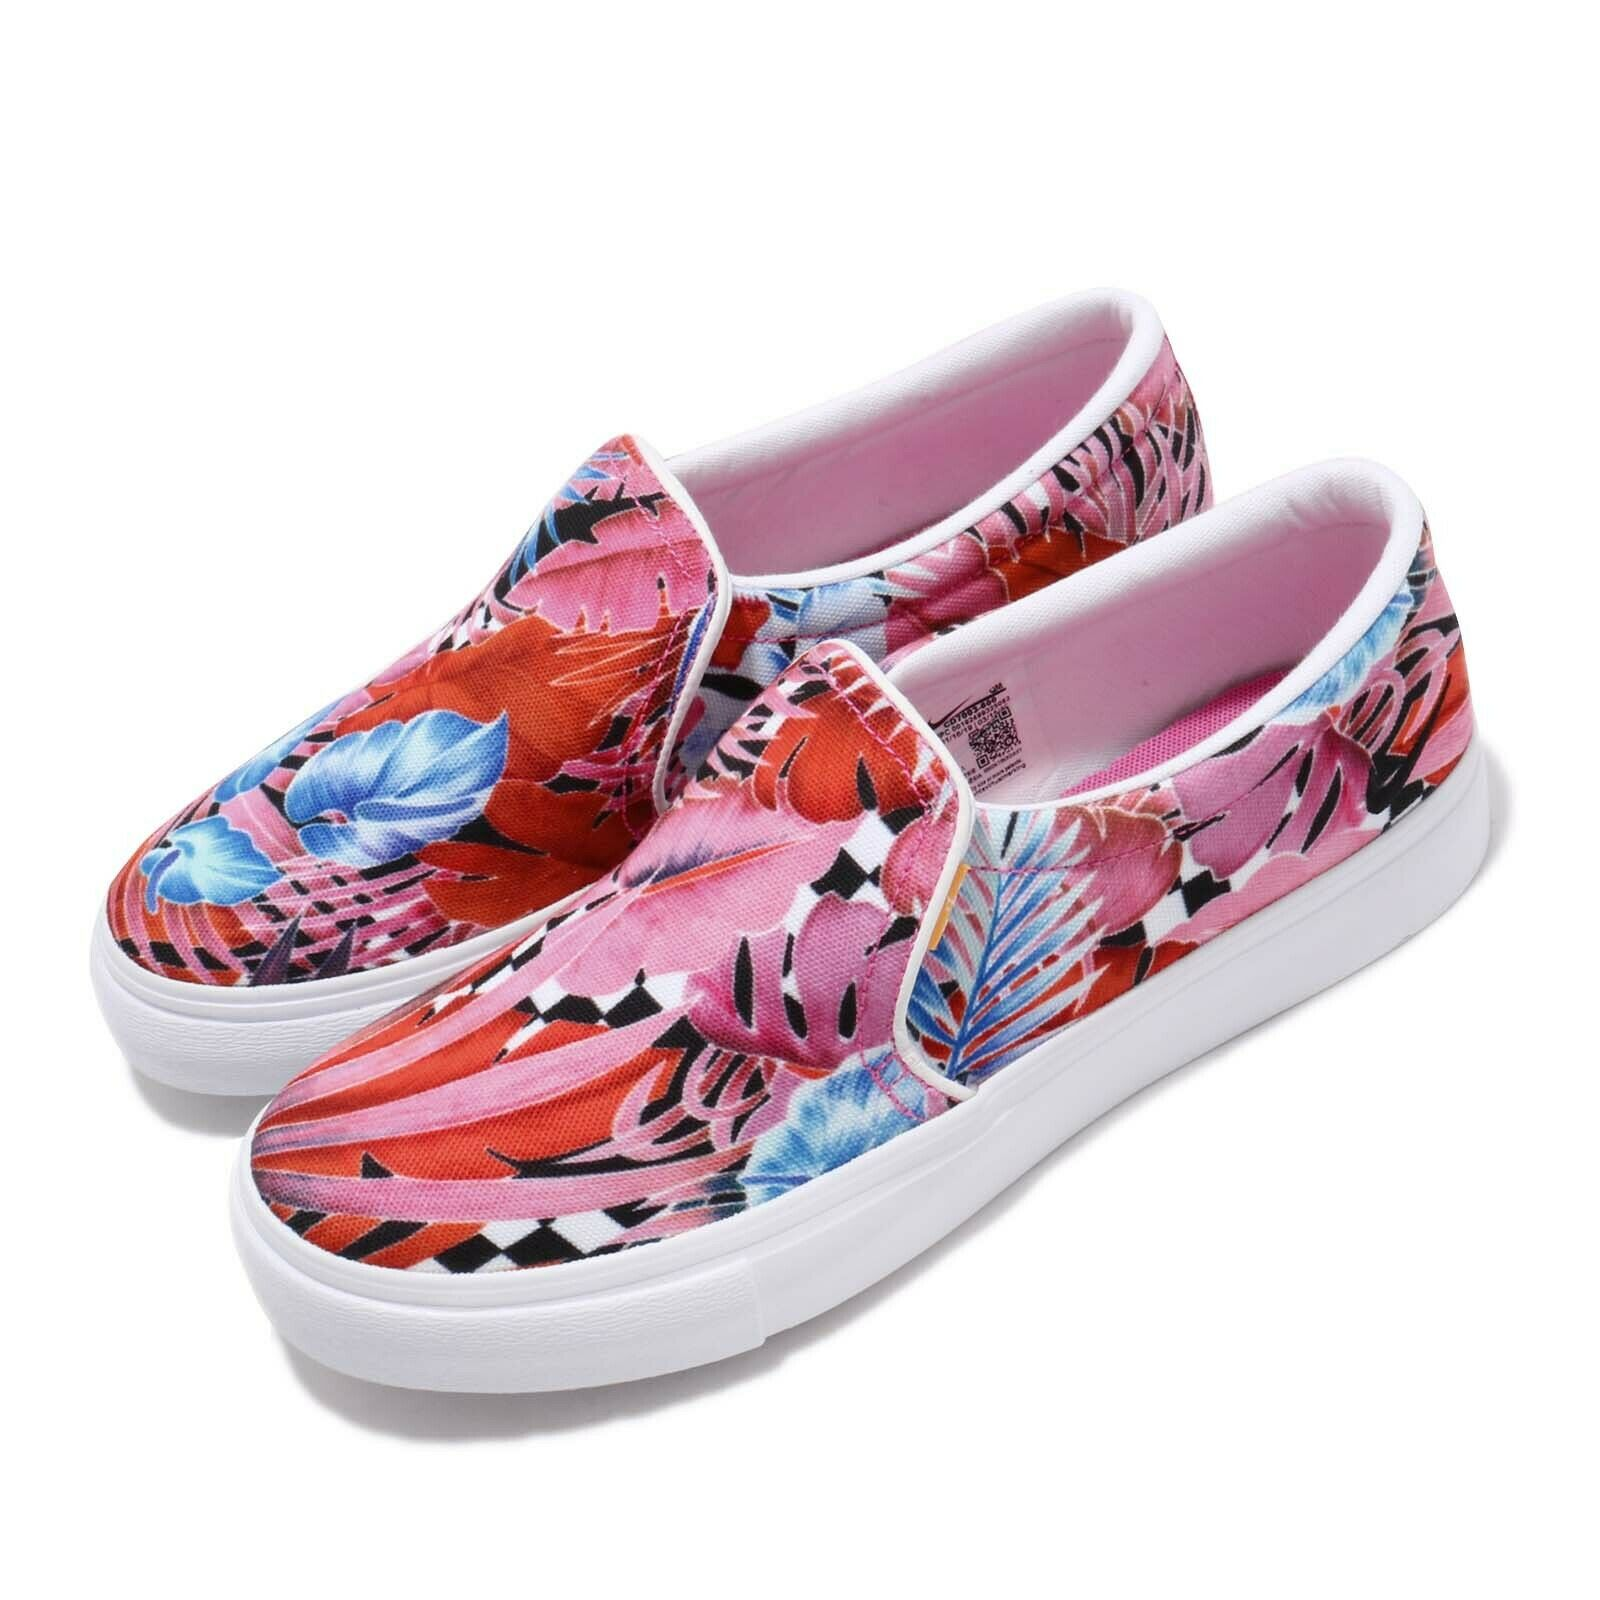 Nike Wmns Corte  Royale AC SLPPT Floral Laser Fuchsia donna scarpe CD703 -600  molte concessioni